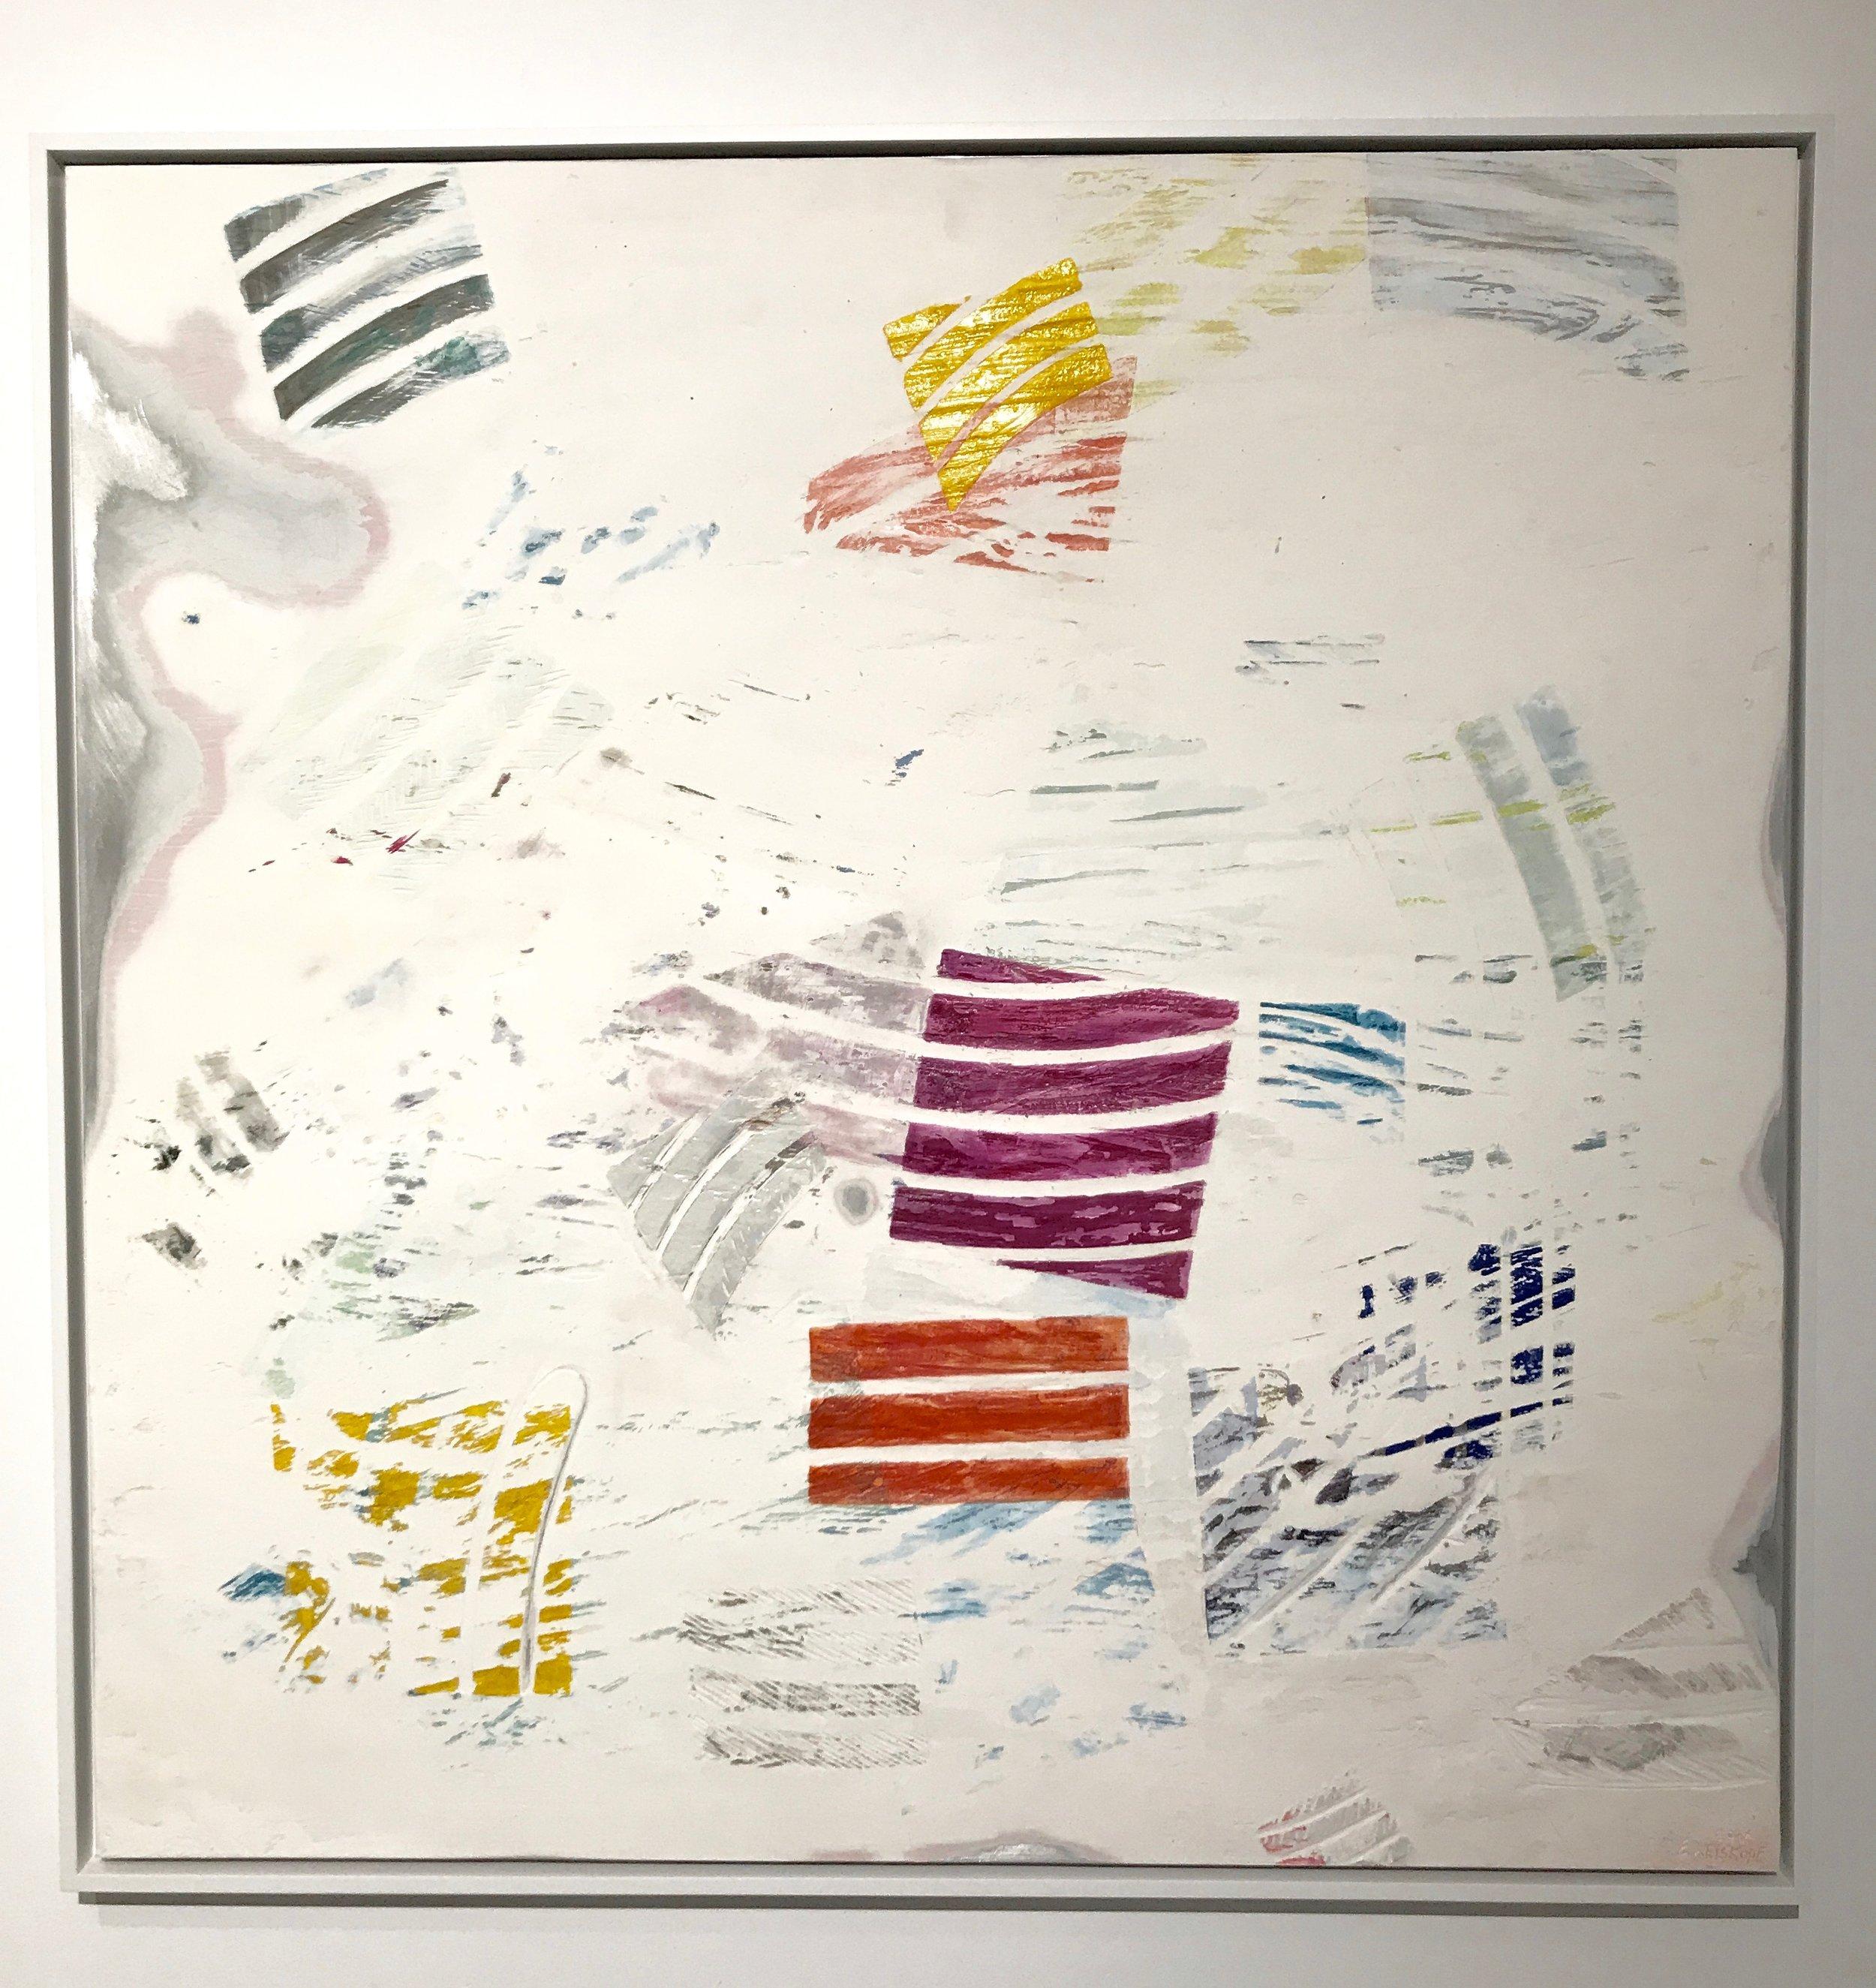 "Emily Weiskopf Matter (of Transformation) 2016 Plaster, enamel, and dye on Aluminum 36"" x 36"""